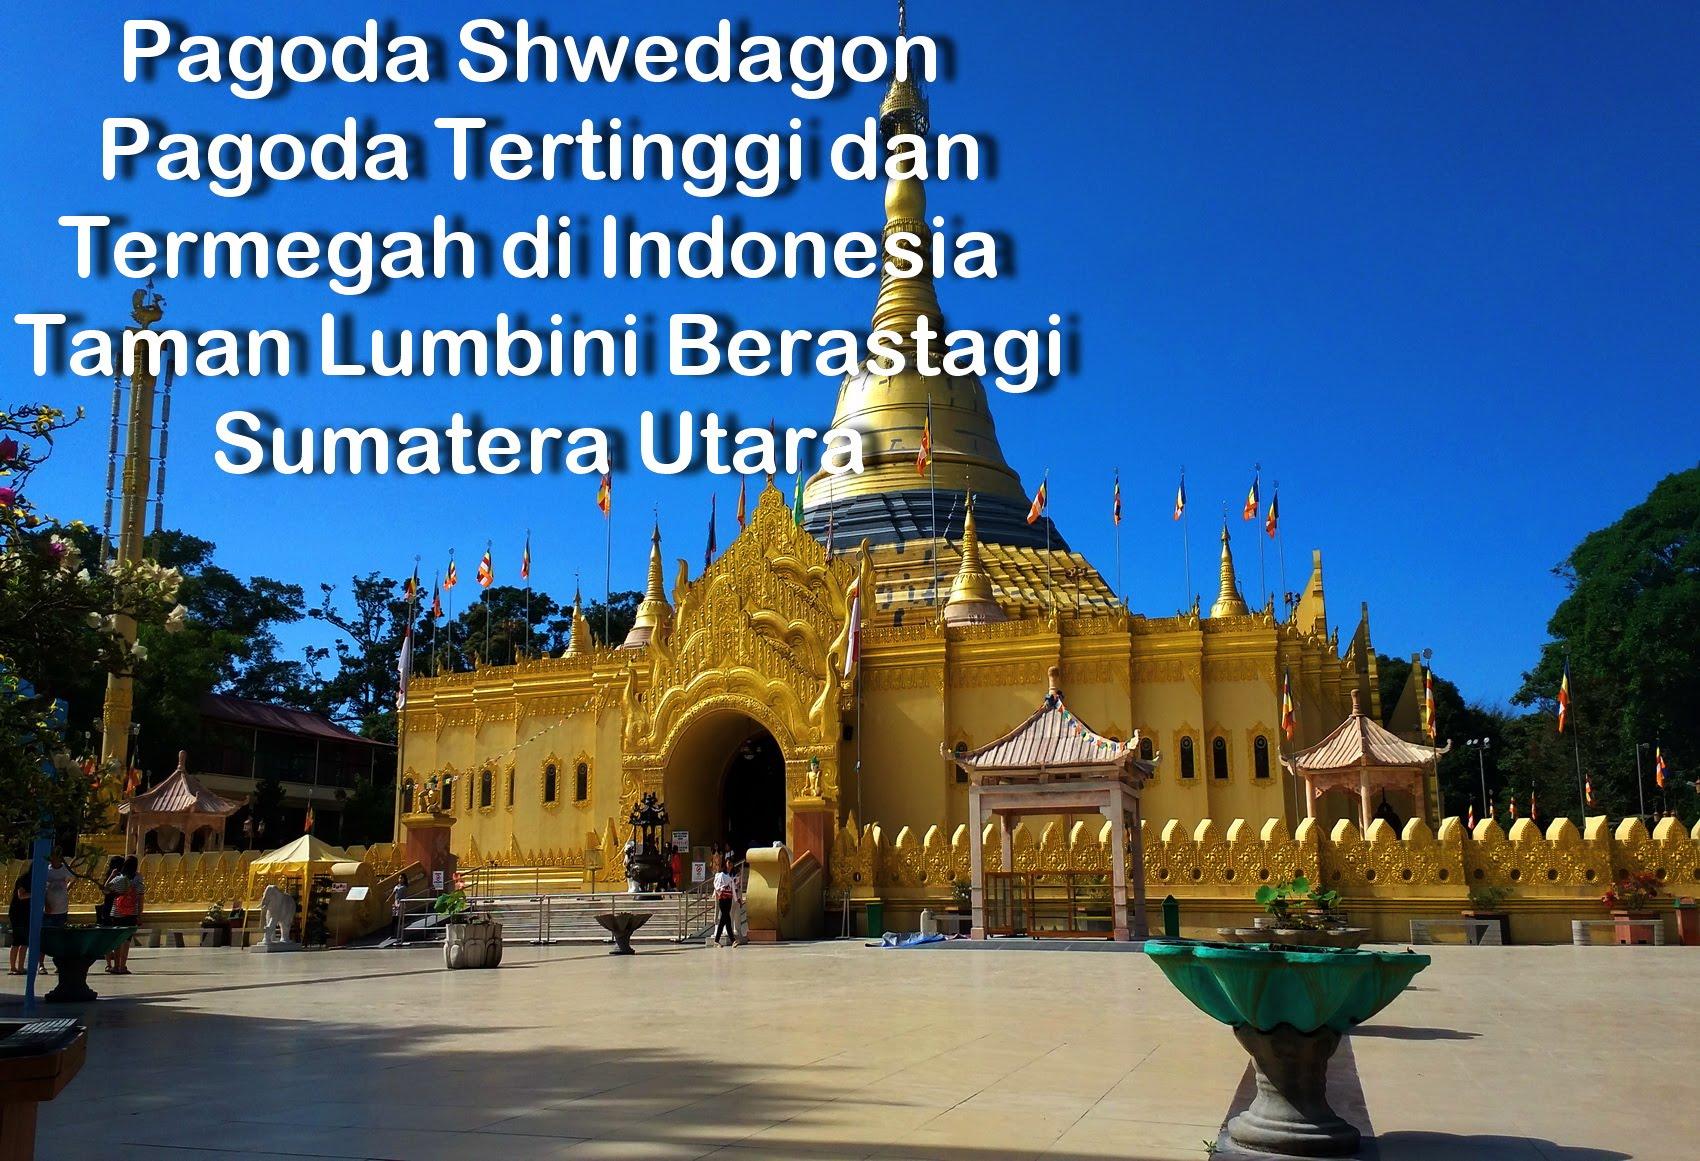 Replika Pagoda Shwedagon Tertinggi Indonesia Taman Lumbini Berastagi Sumatera Utara